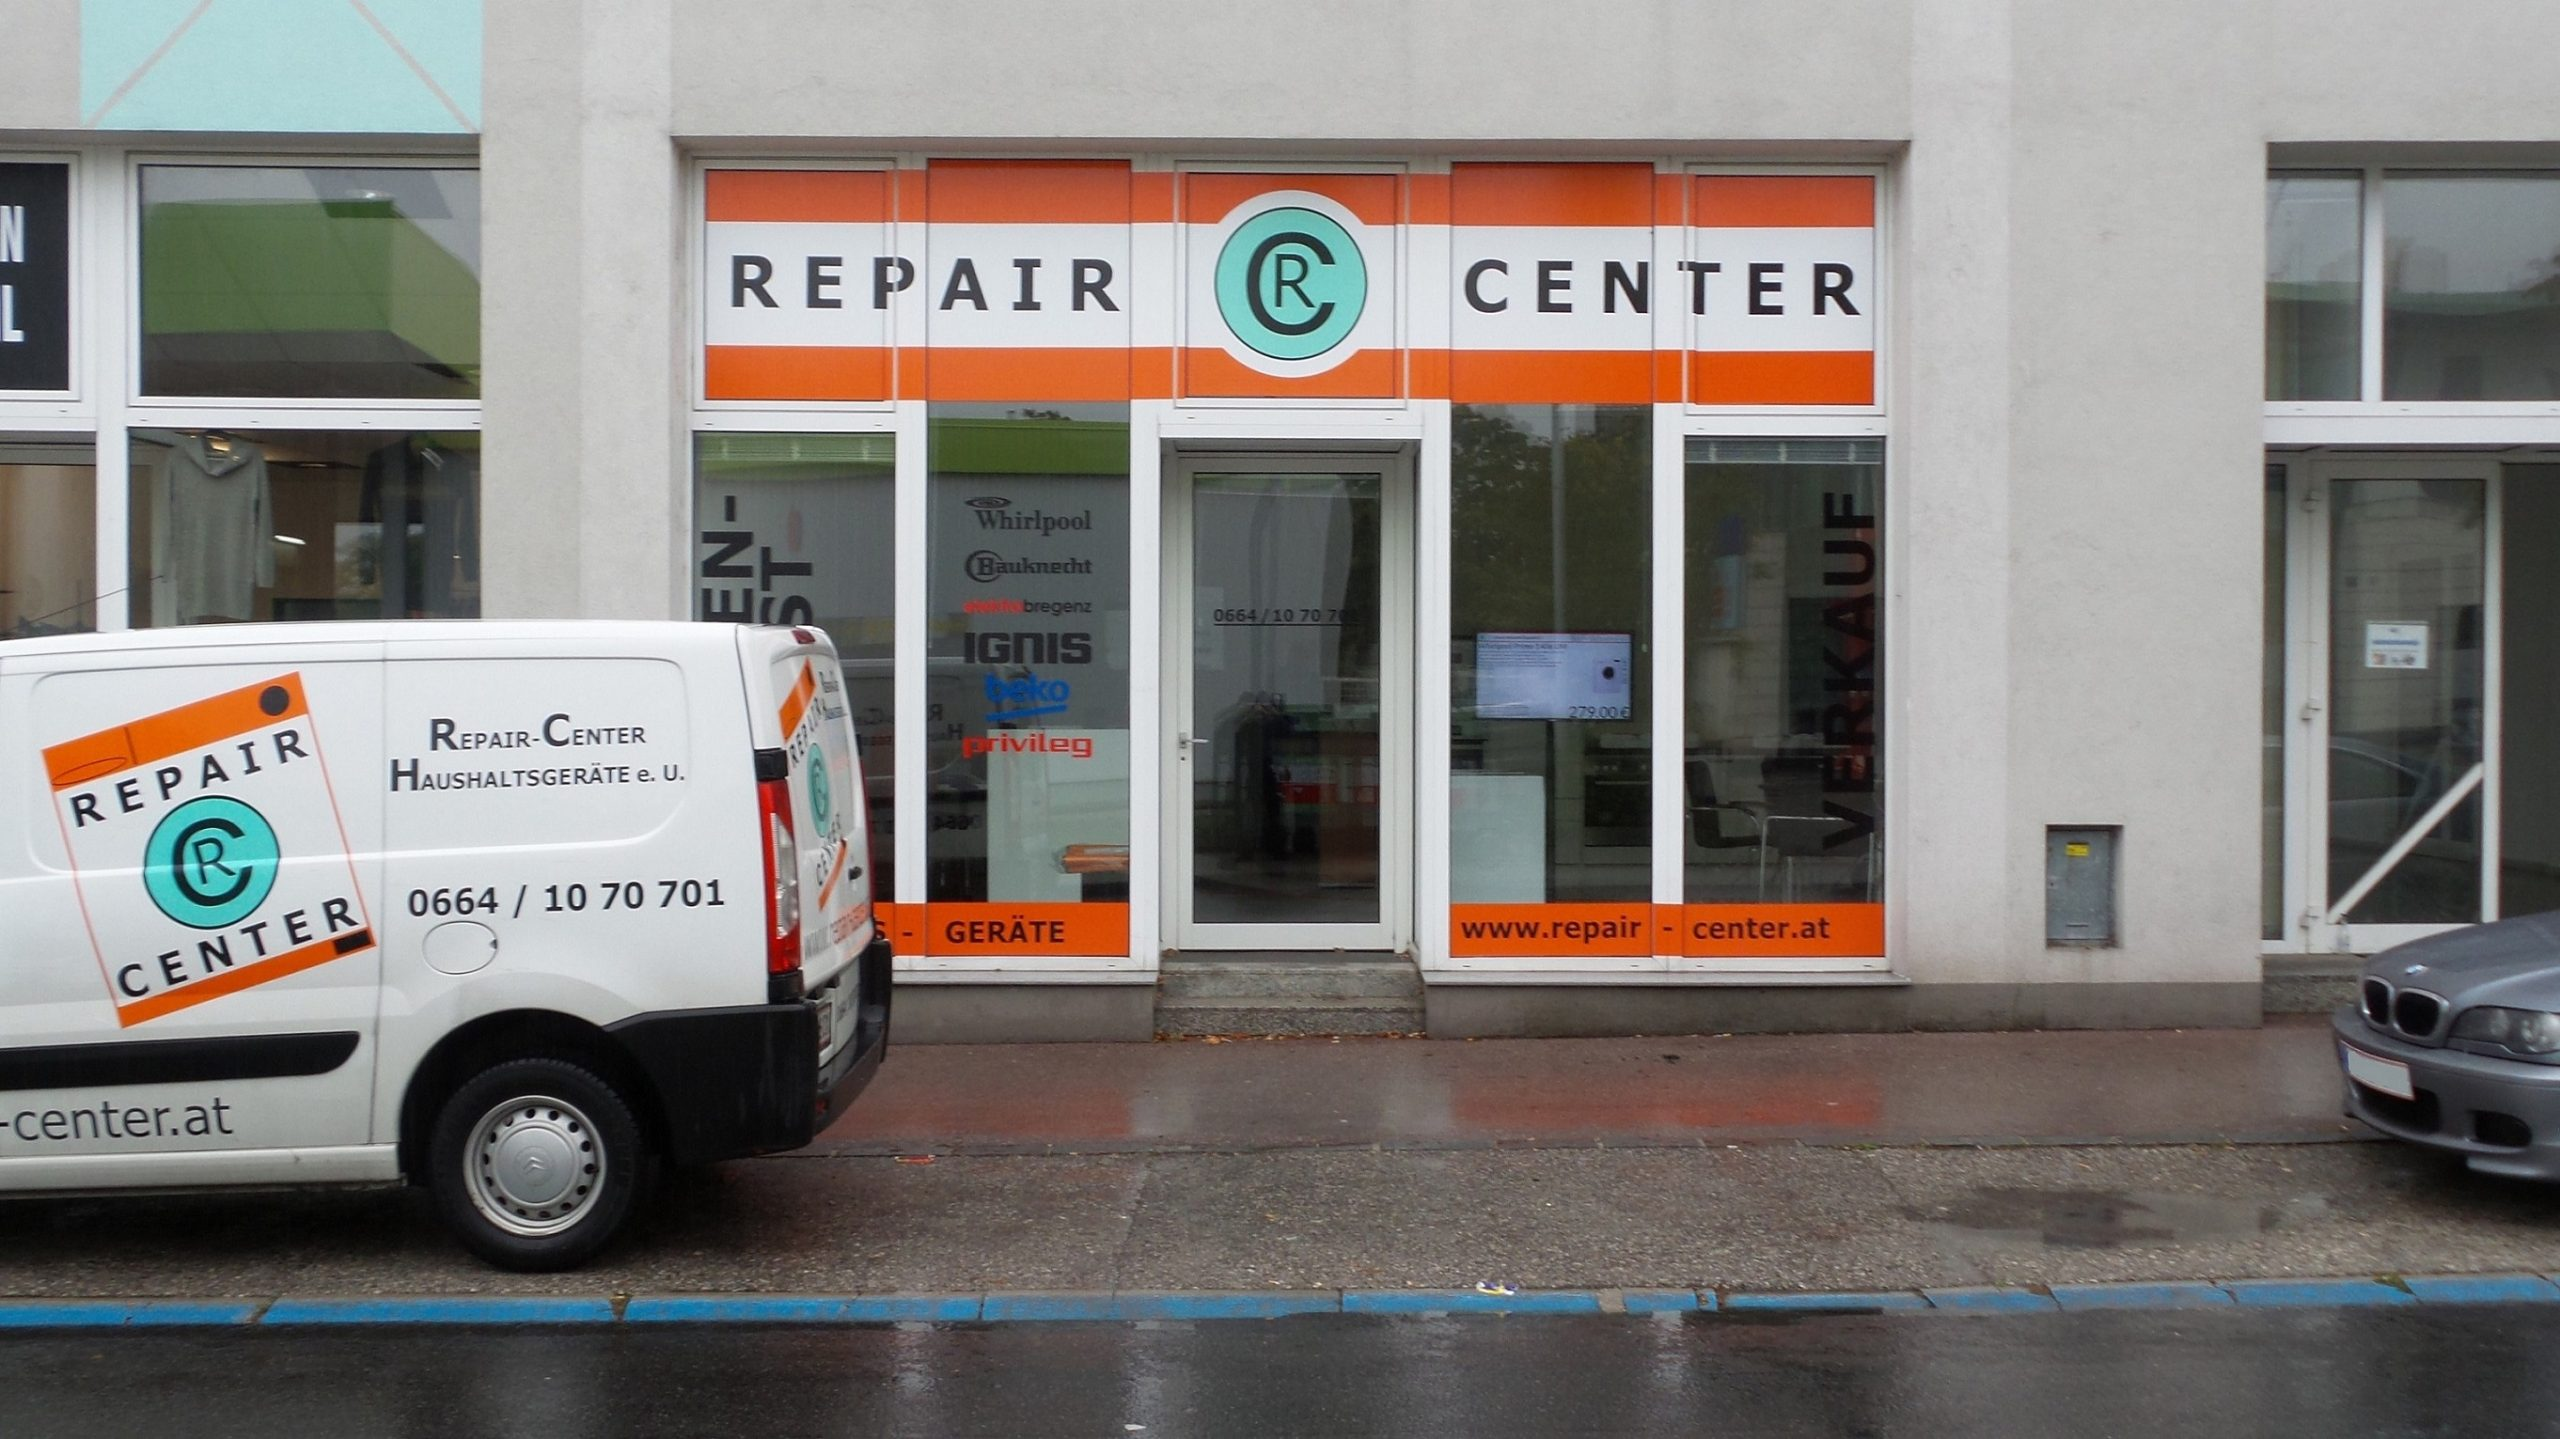 Geschäftslokal Reparatur Service Handel Haushaltsgeräte